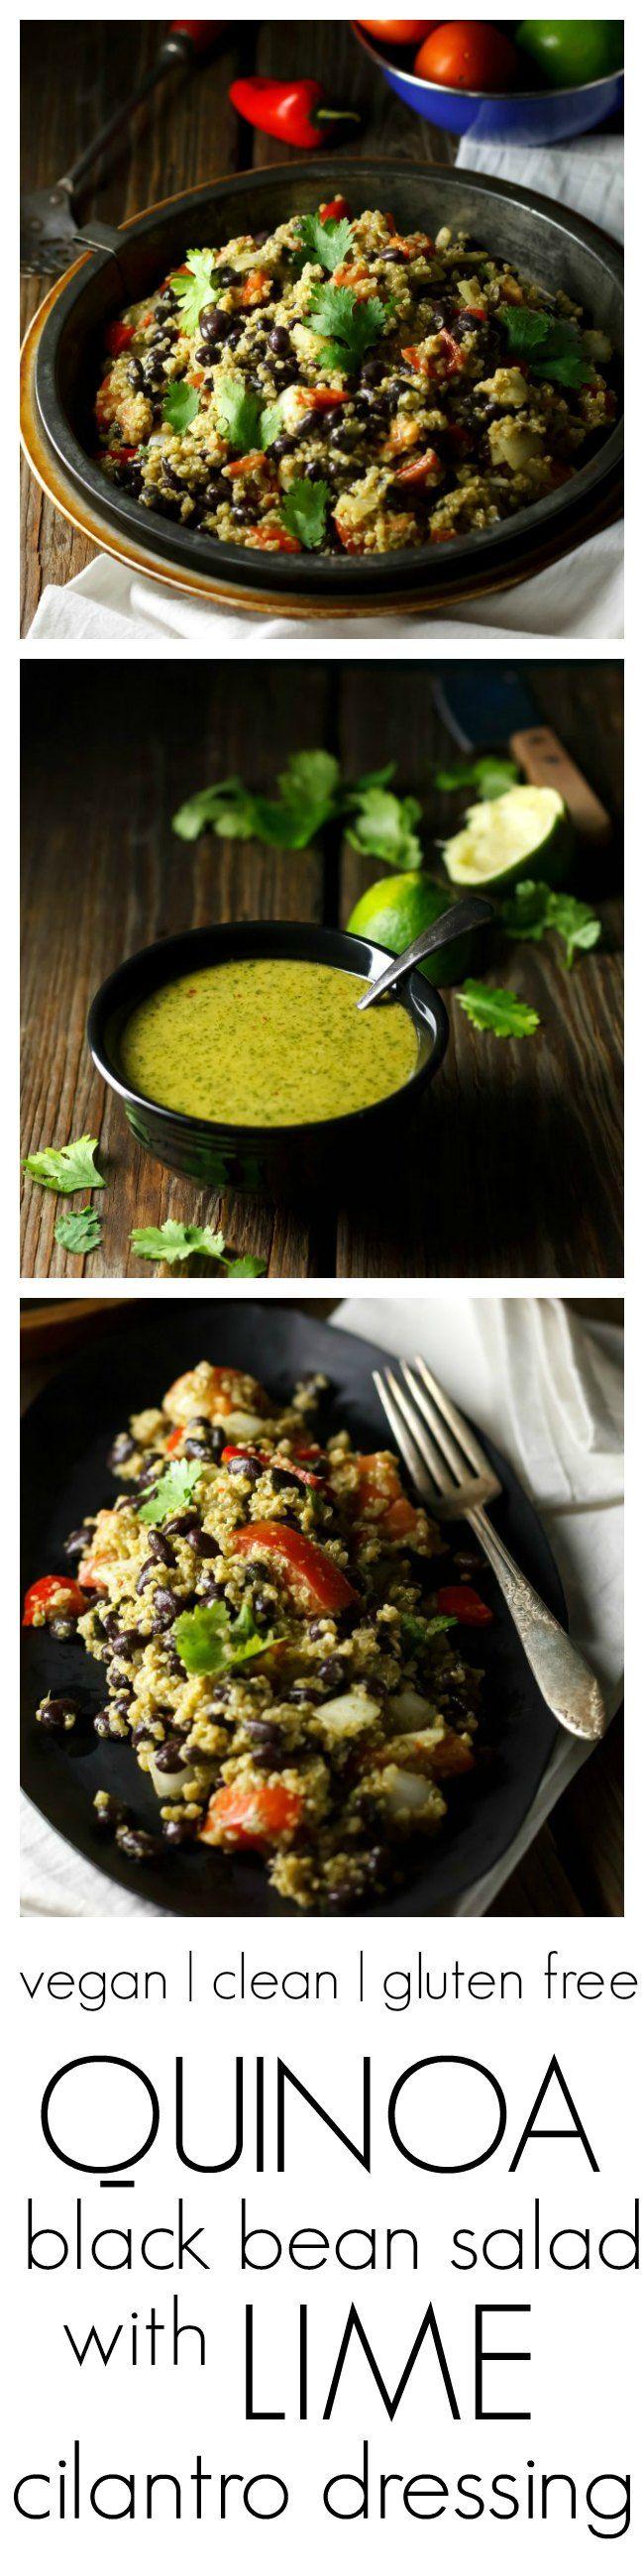 Quinoa Black Bean Salad with Lime Cilantro Dressing |